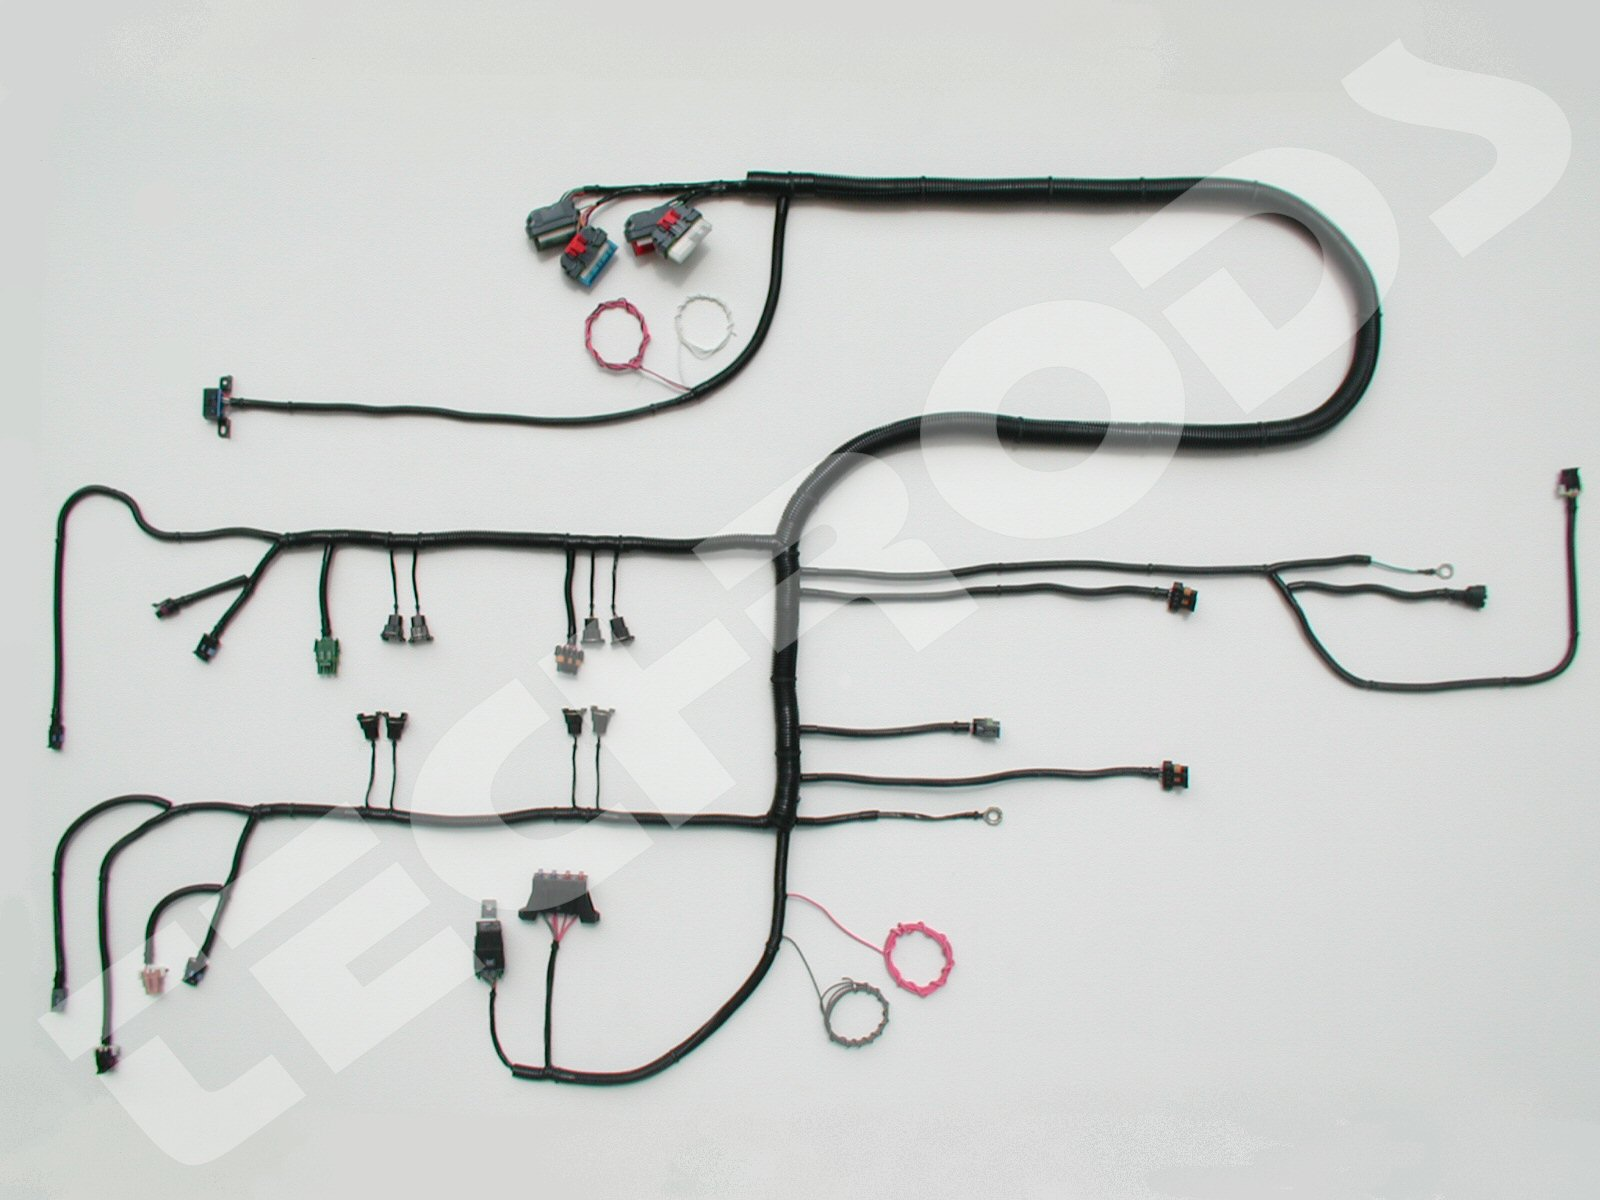 NC_1940] Exploded View Lt1 Wiring Harness Schematic WiringWww Mohammedshrine Librar Wiring 101